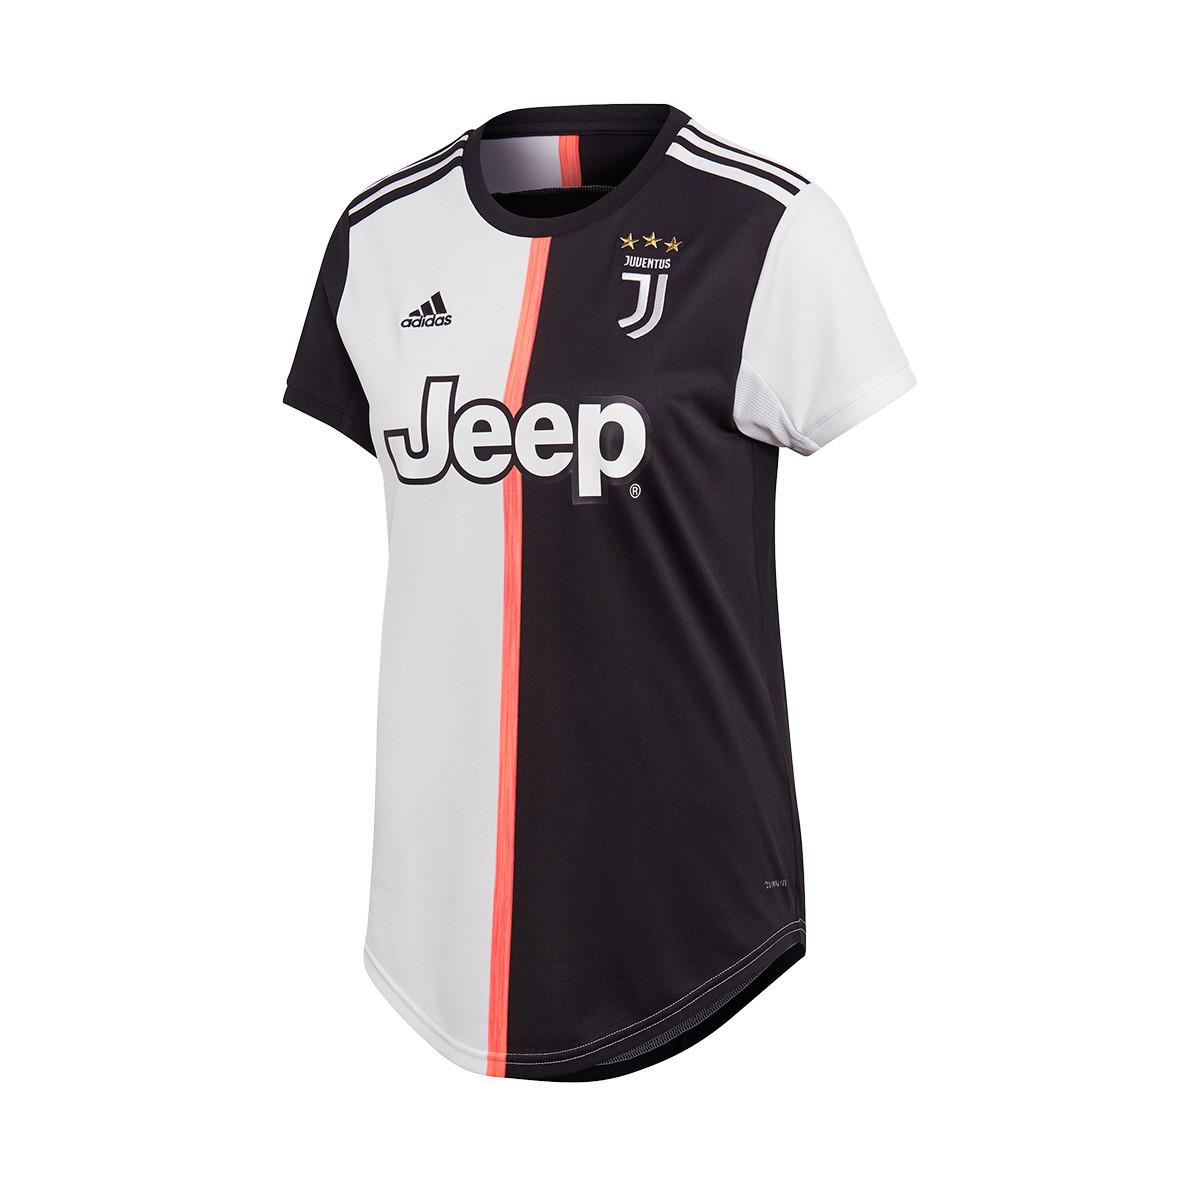 7cfd0d068 Jersey adidas Juventus Primera Equipación 2019-2020 Mujer Black ...